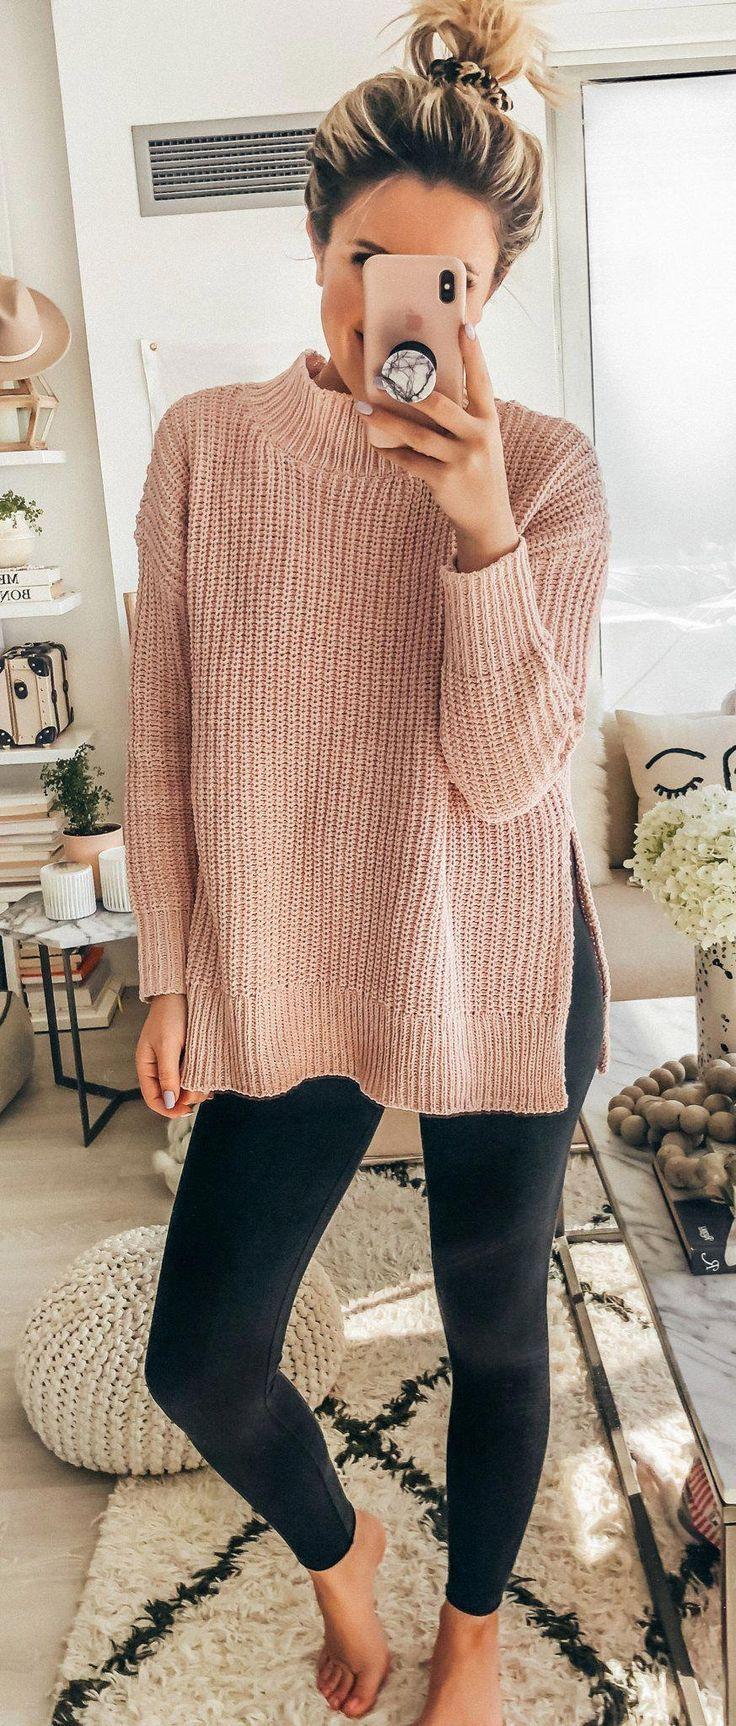 outfits invierno con falda #Streetstyle 2